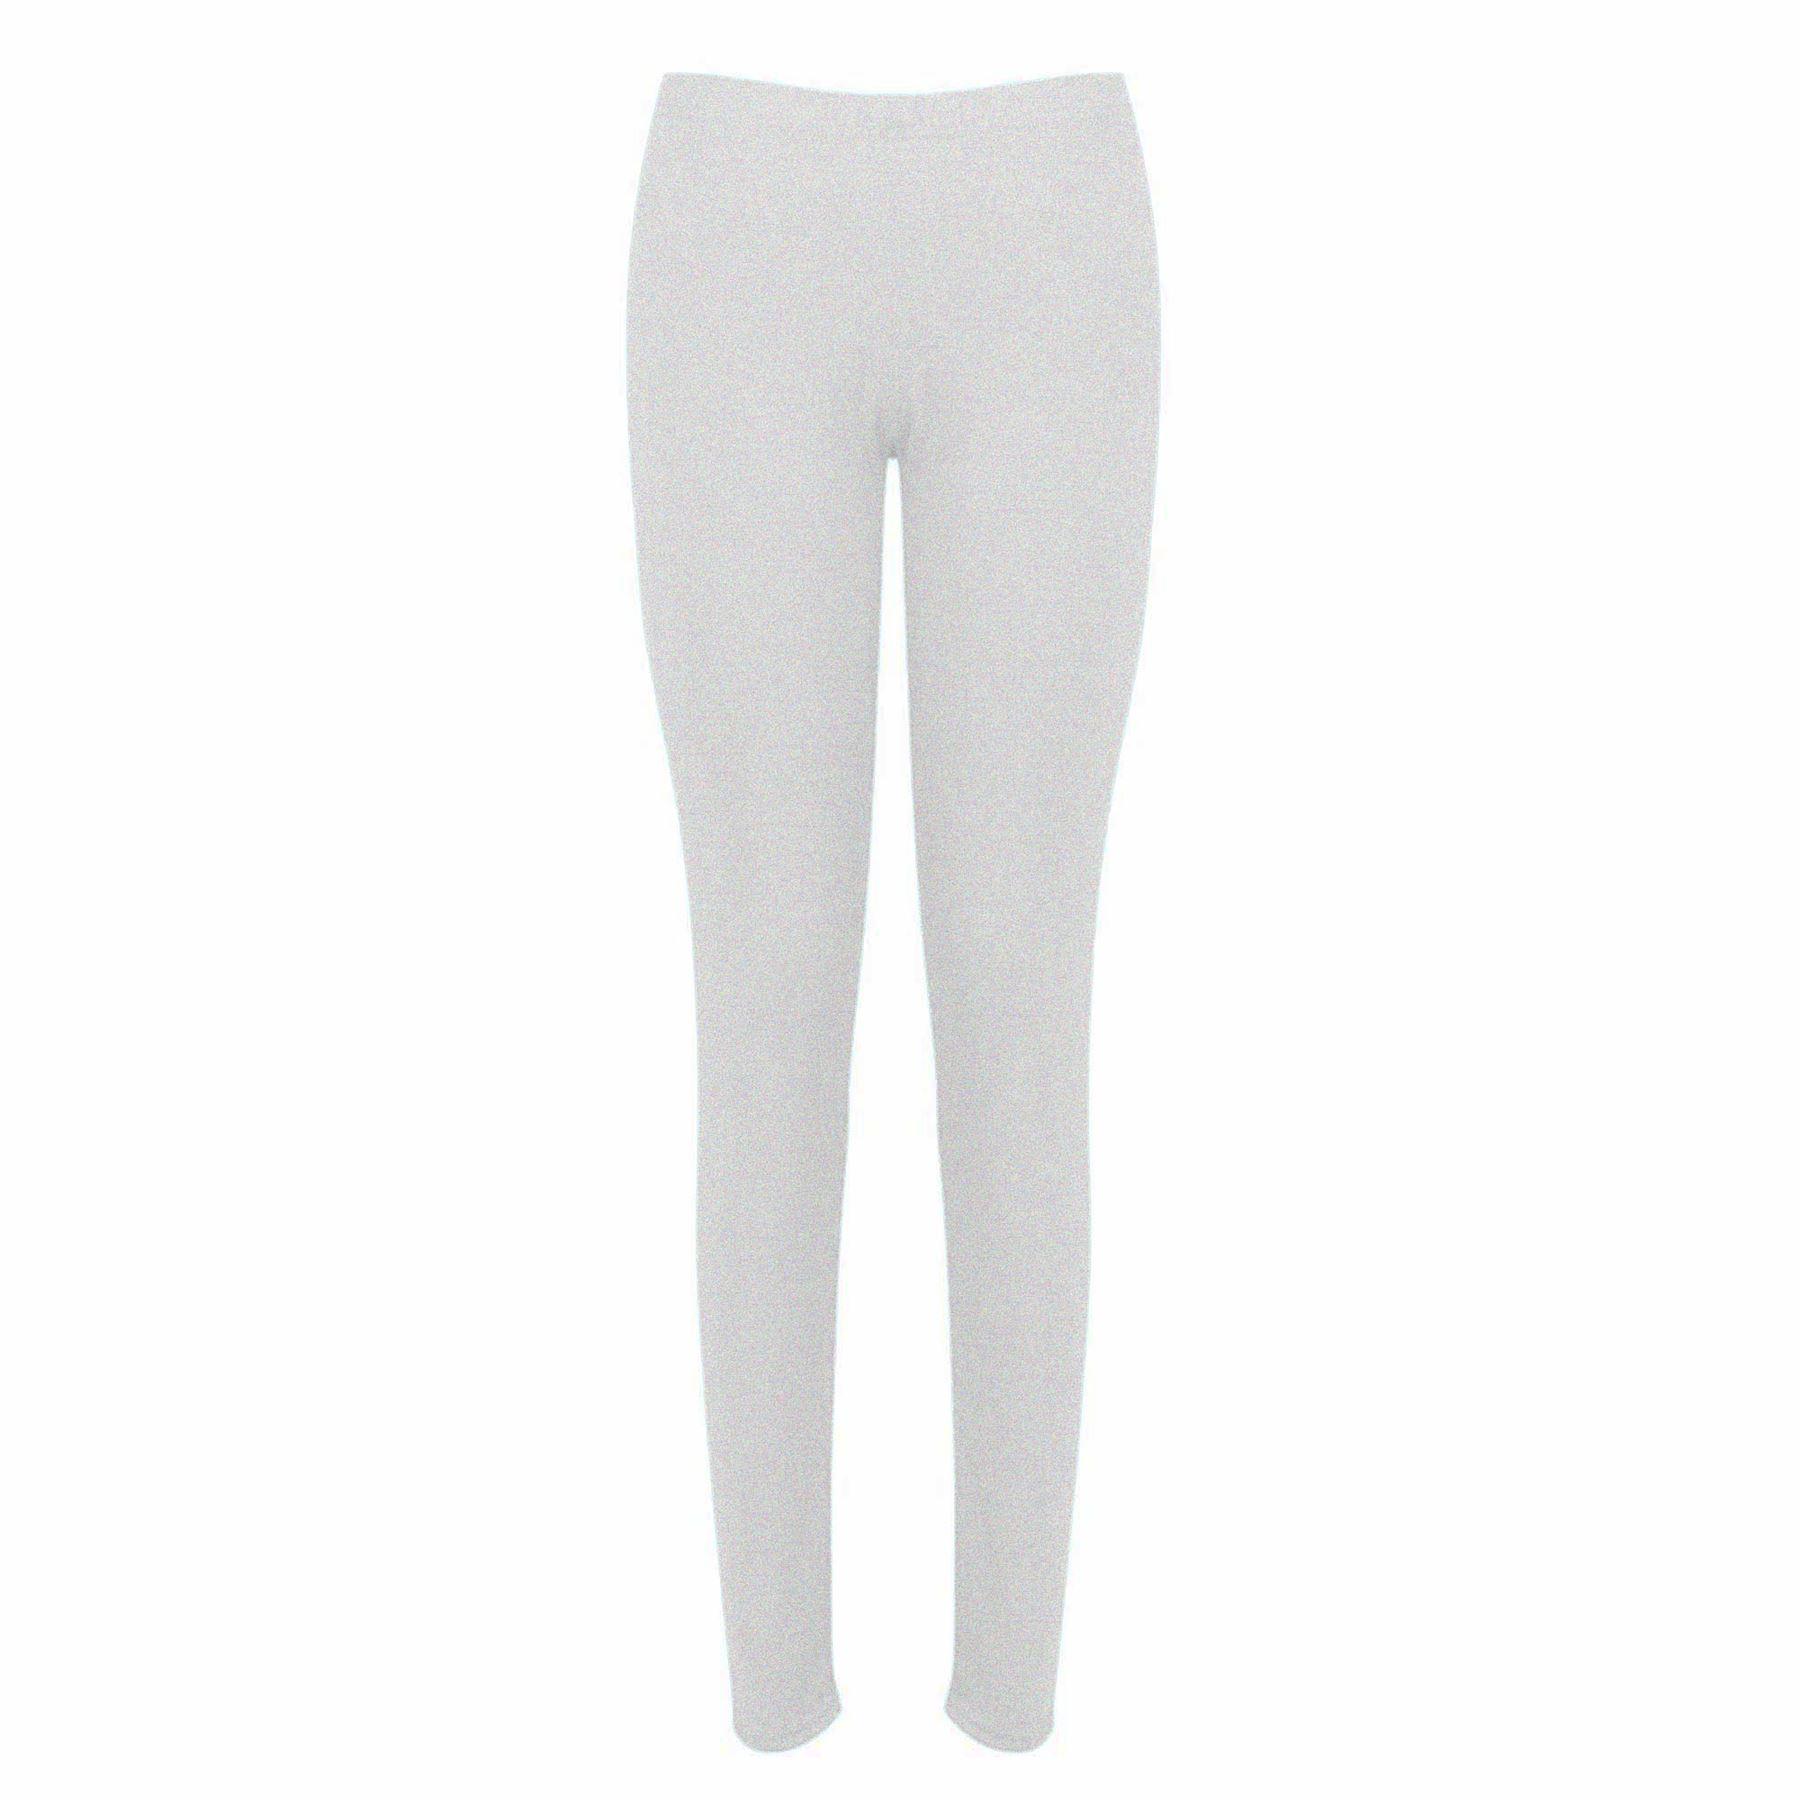 Womens Ladies Plain Basic Stretchy Full Ankle Length Trousers Pants Leggings